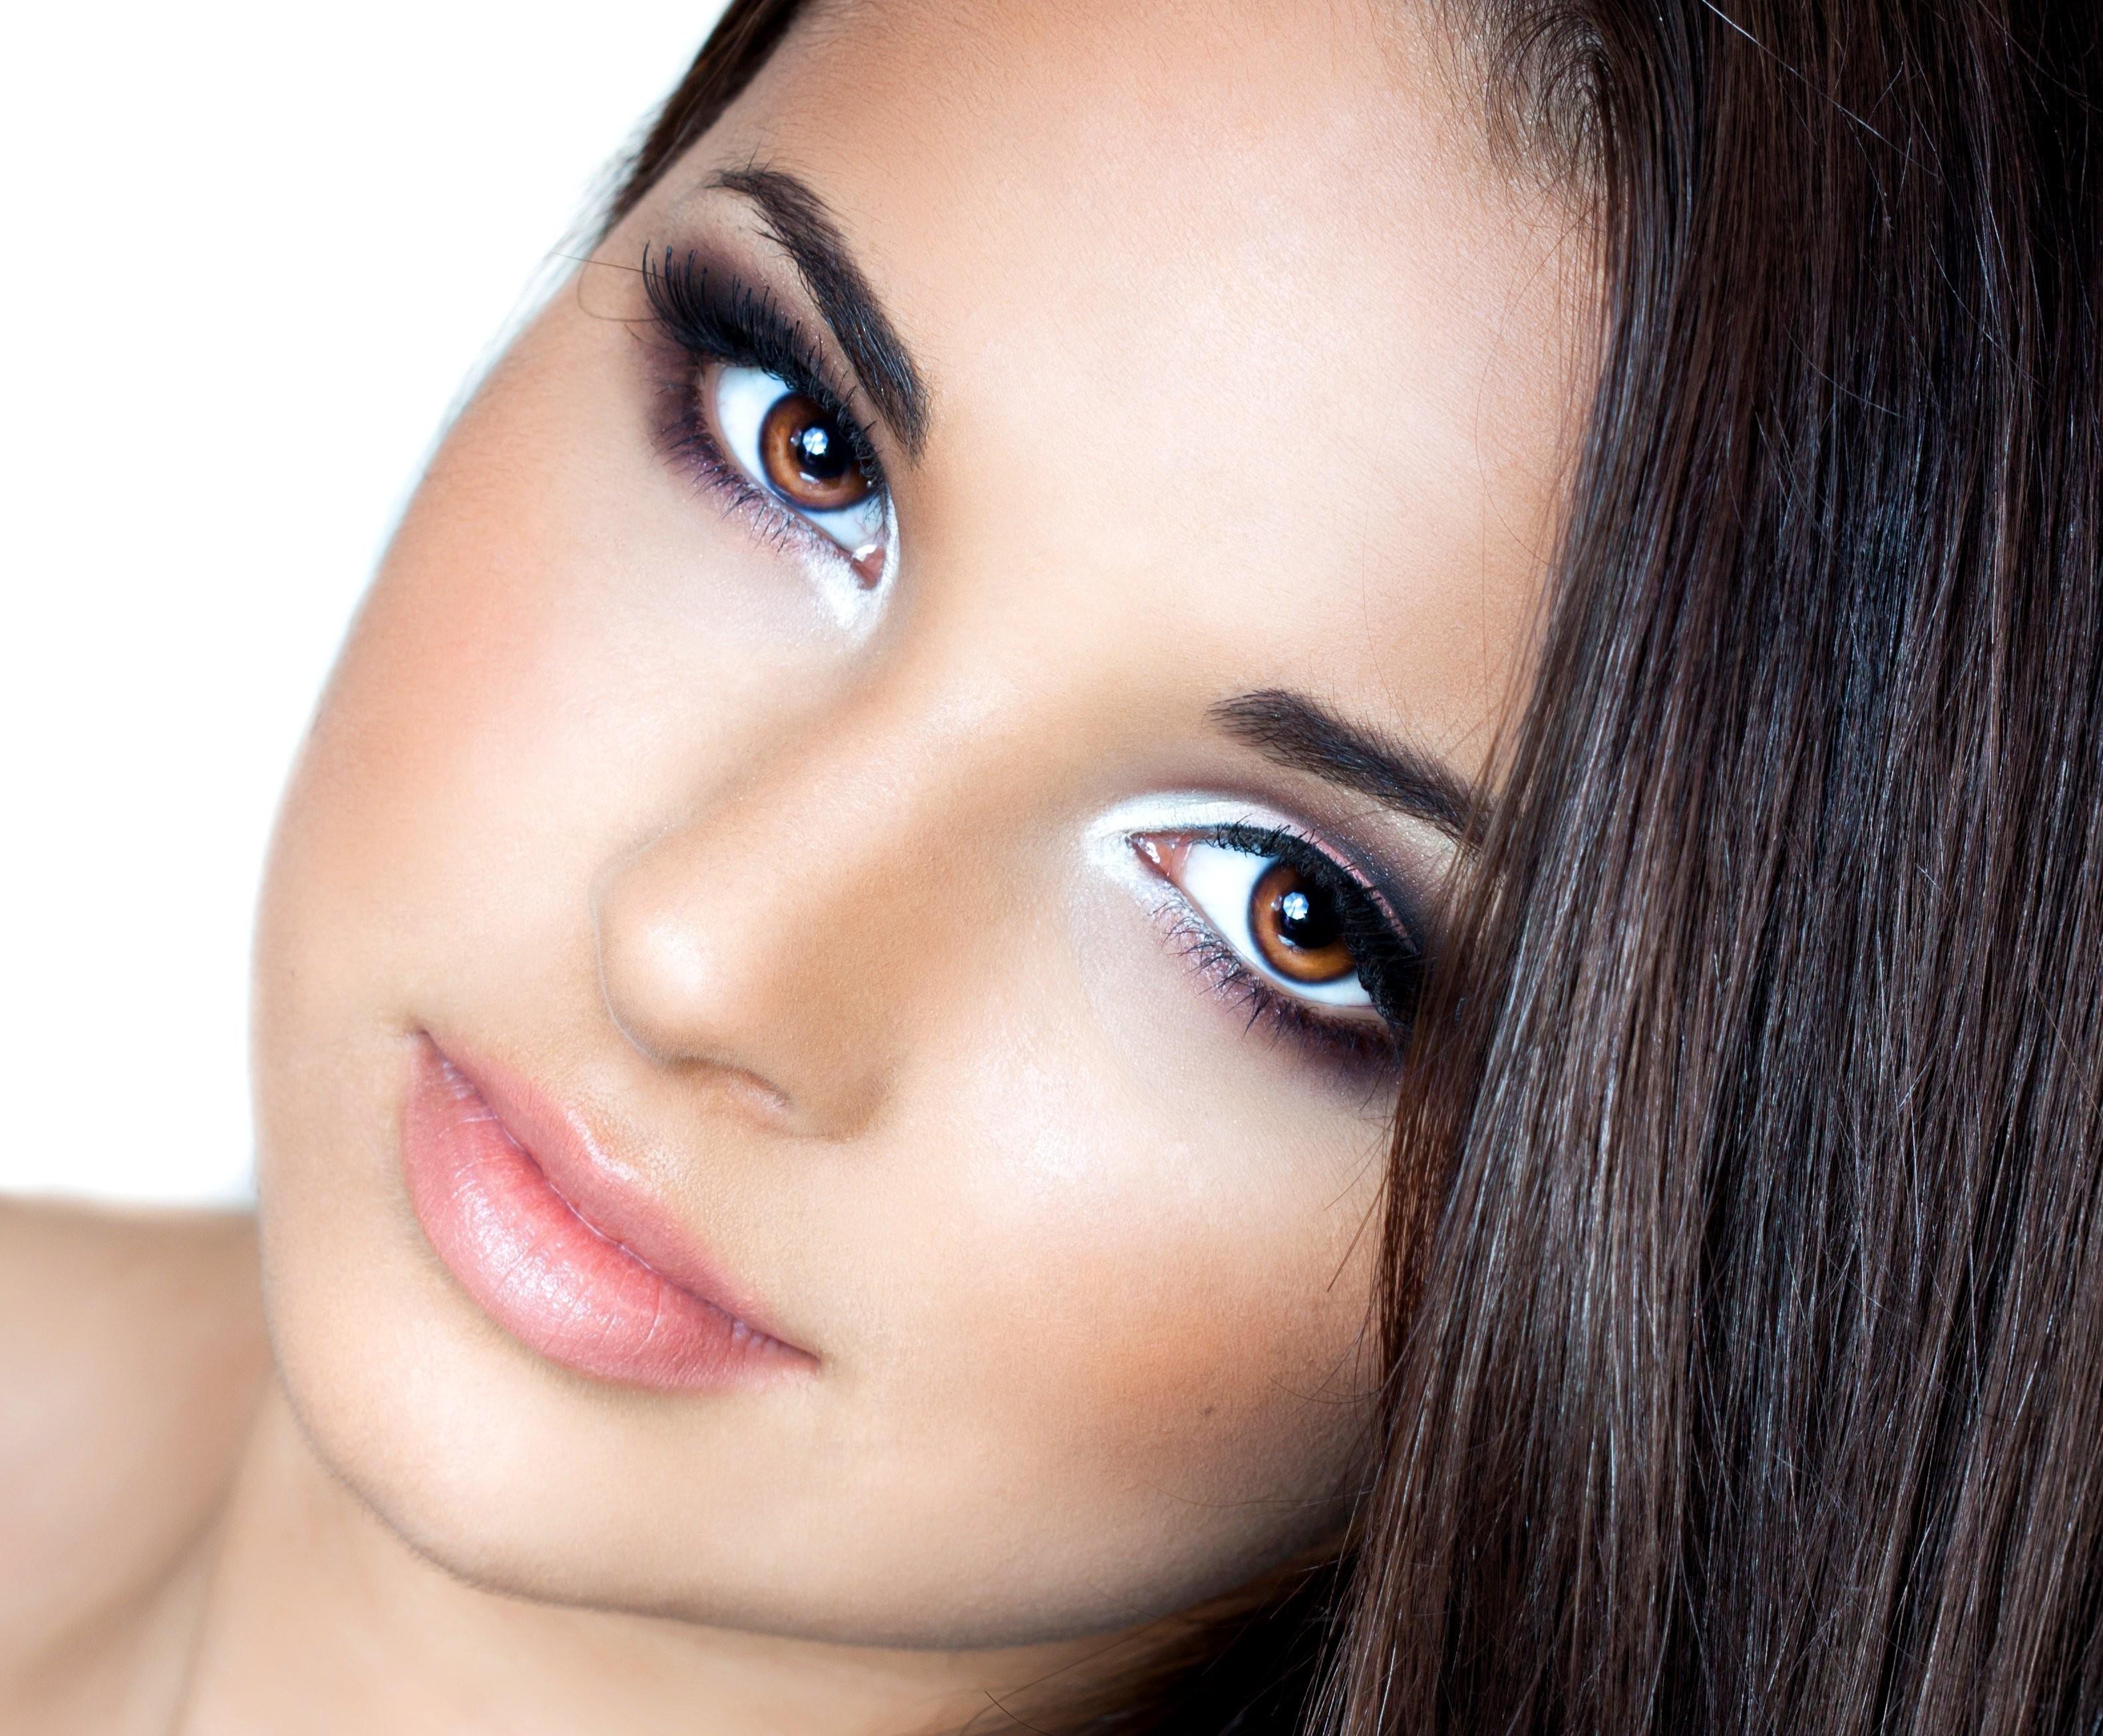 Картинки красивой девушки лицо